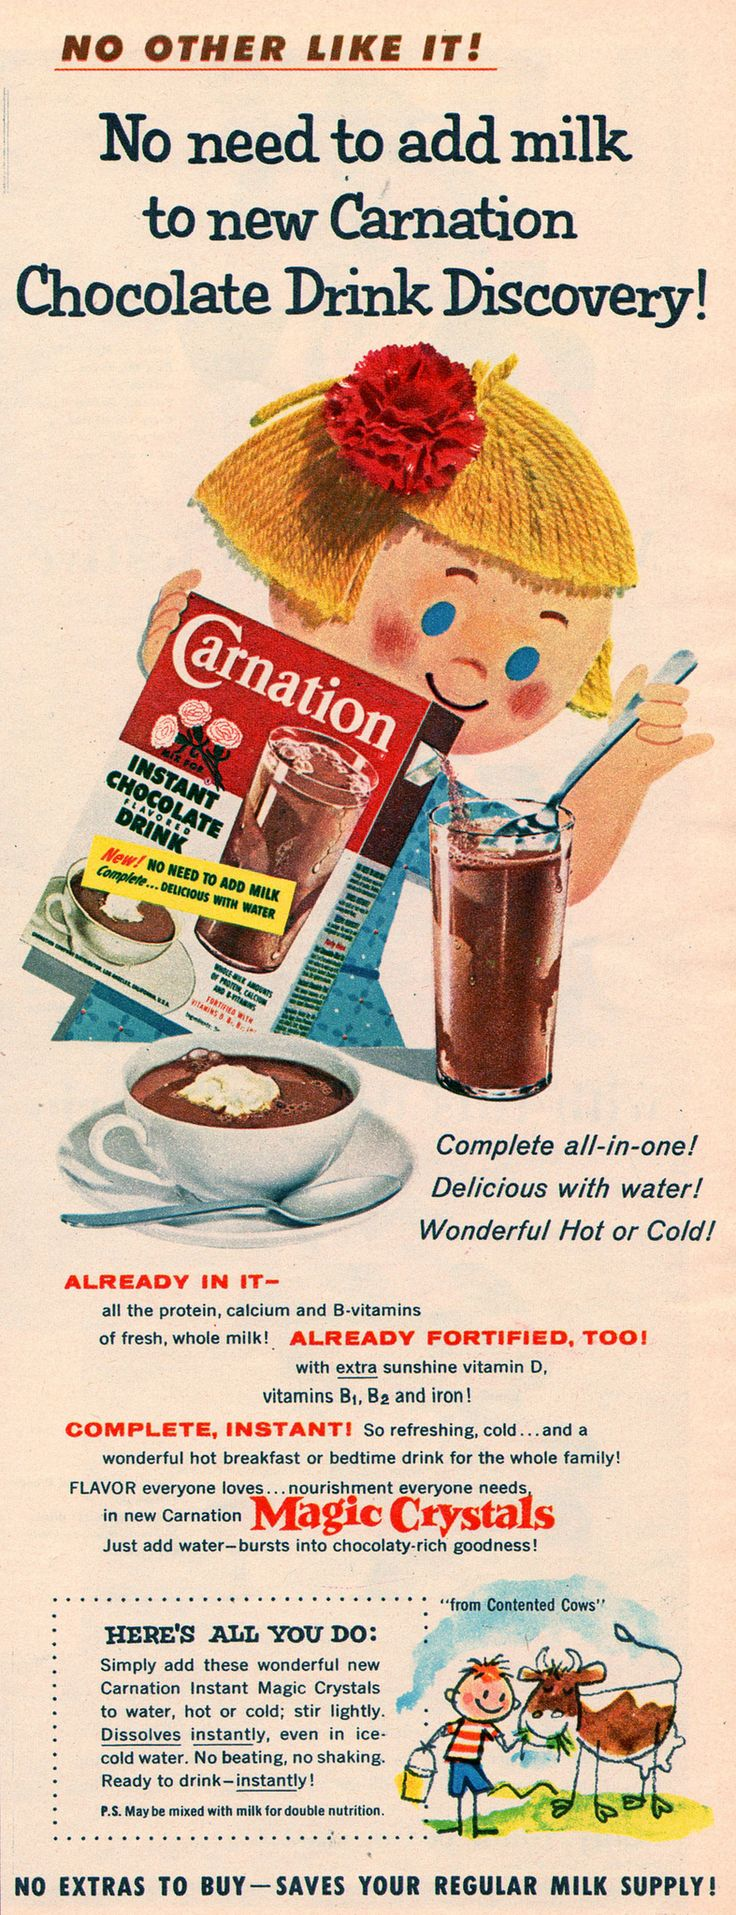 carnation chocolate drink 1955 | Flickr - Photo Sharing!